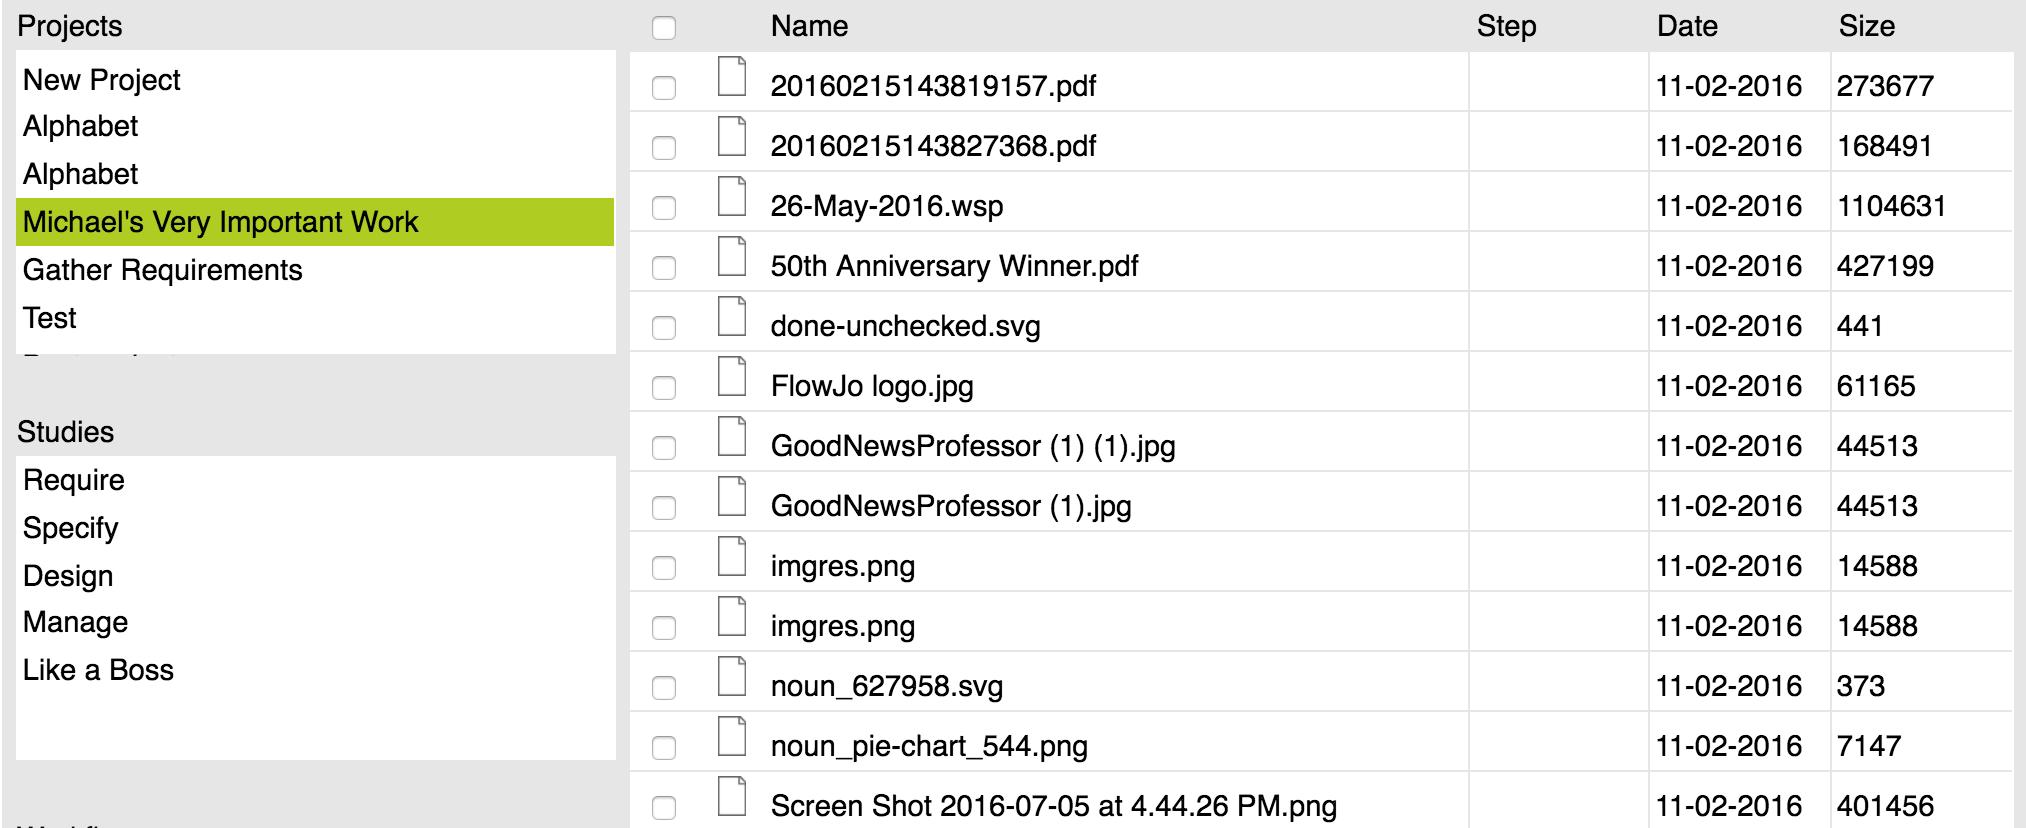 exp-filefilt-proj